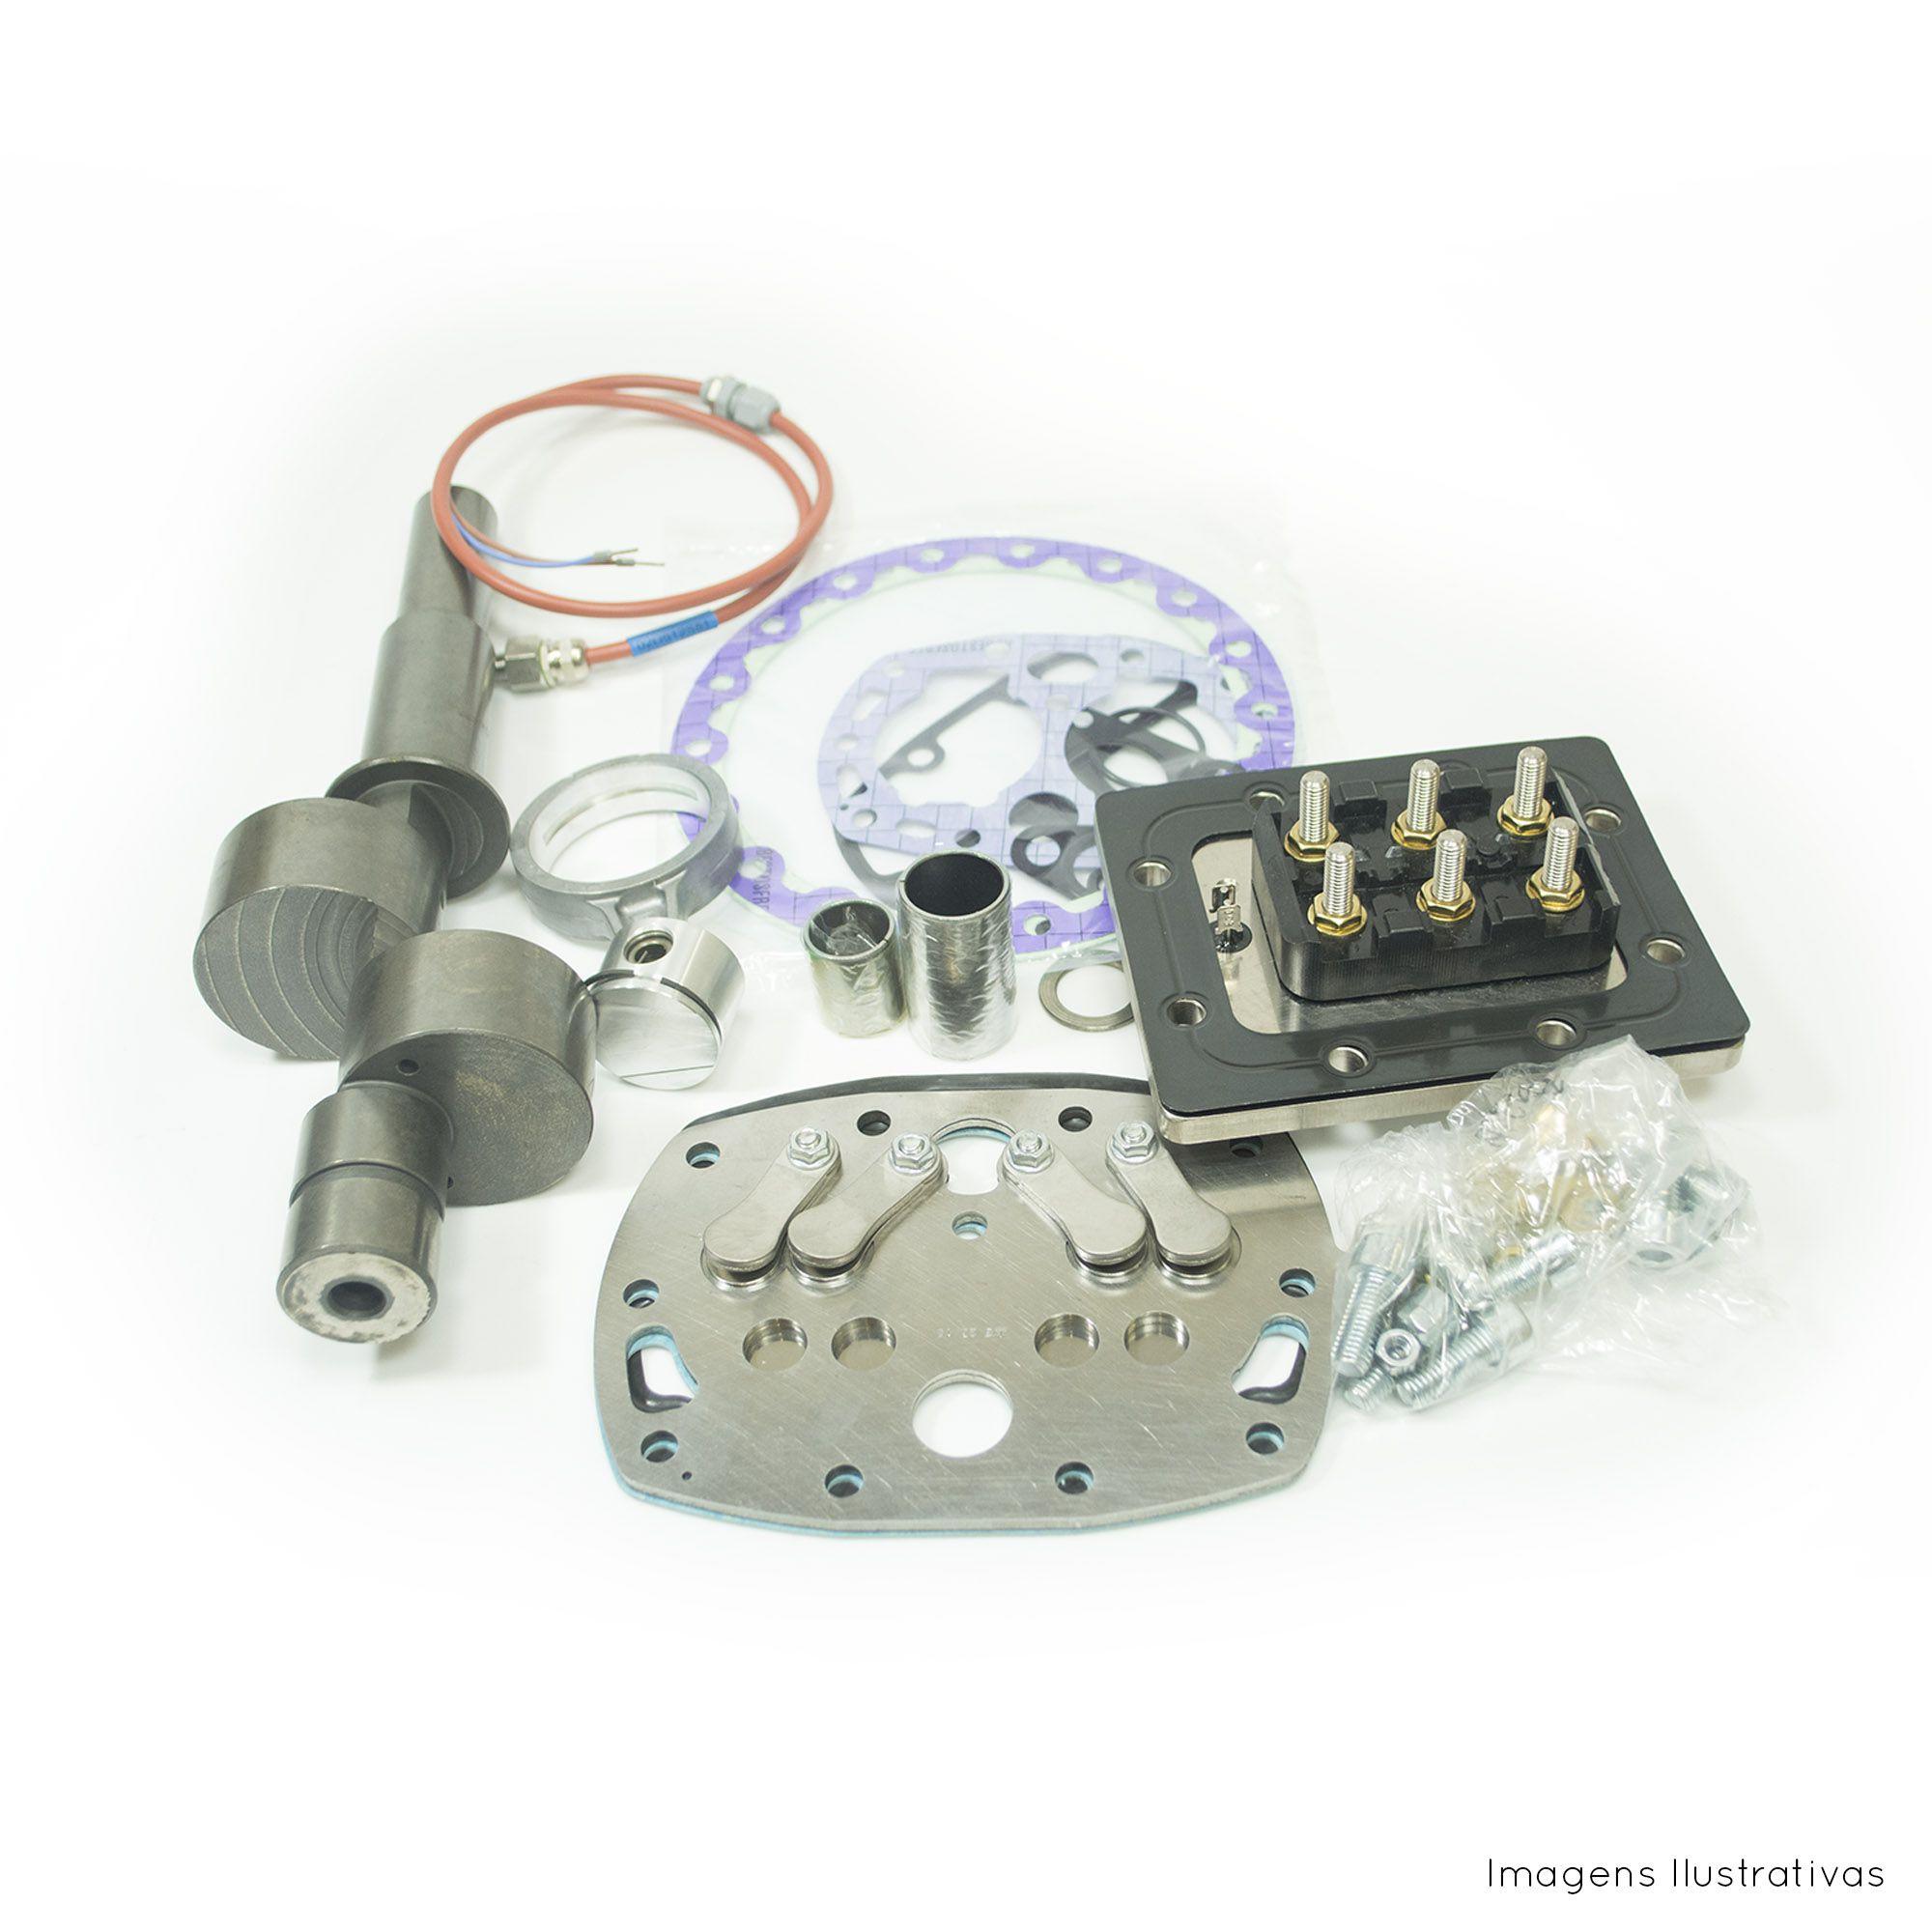 Kit de conexão elétrica 900-10509